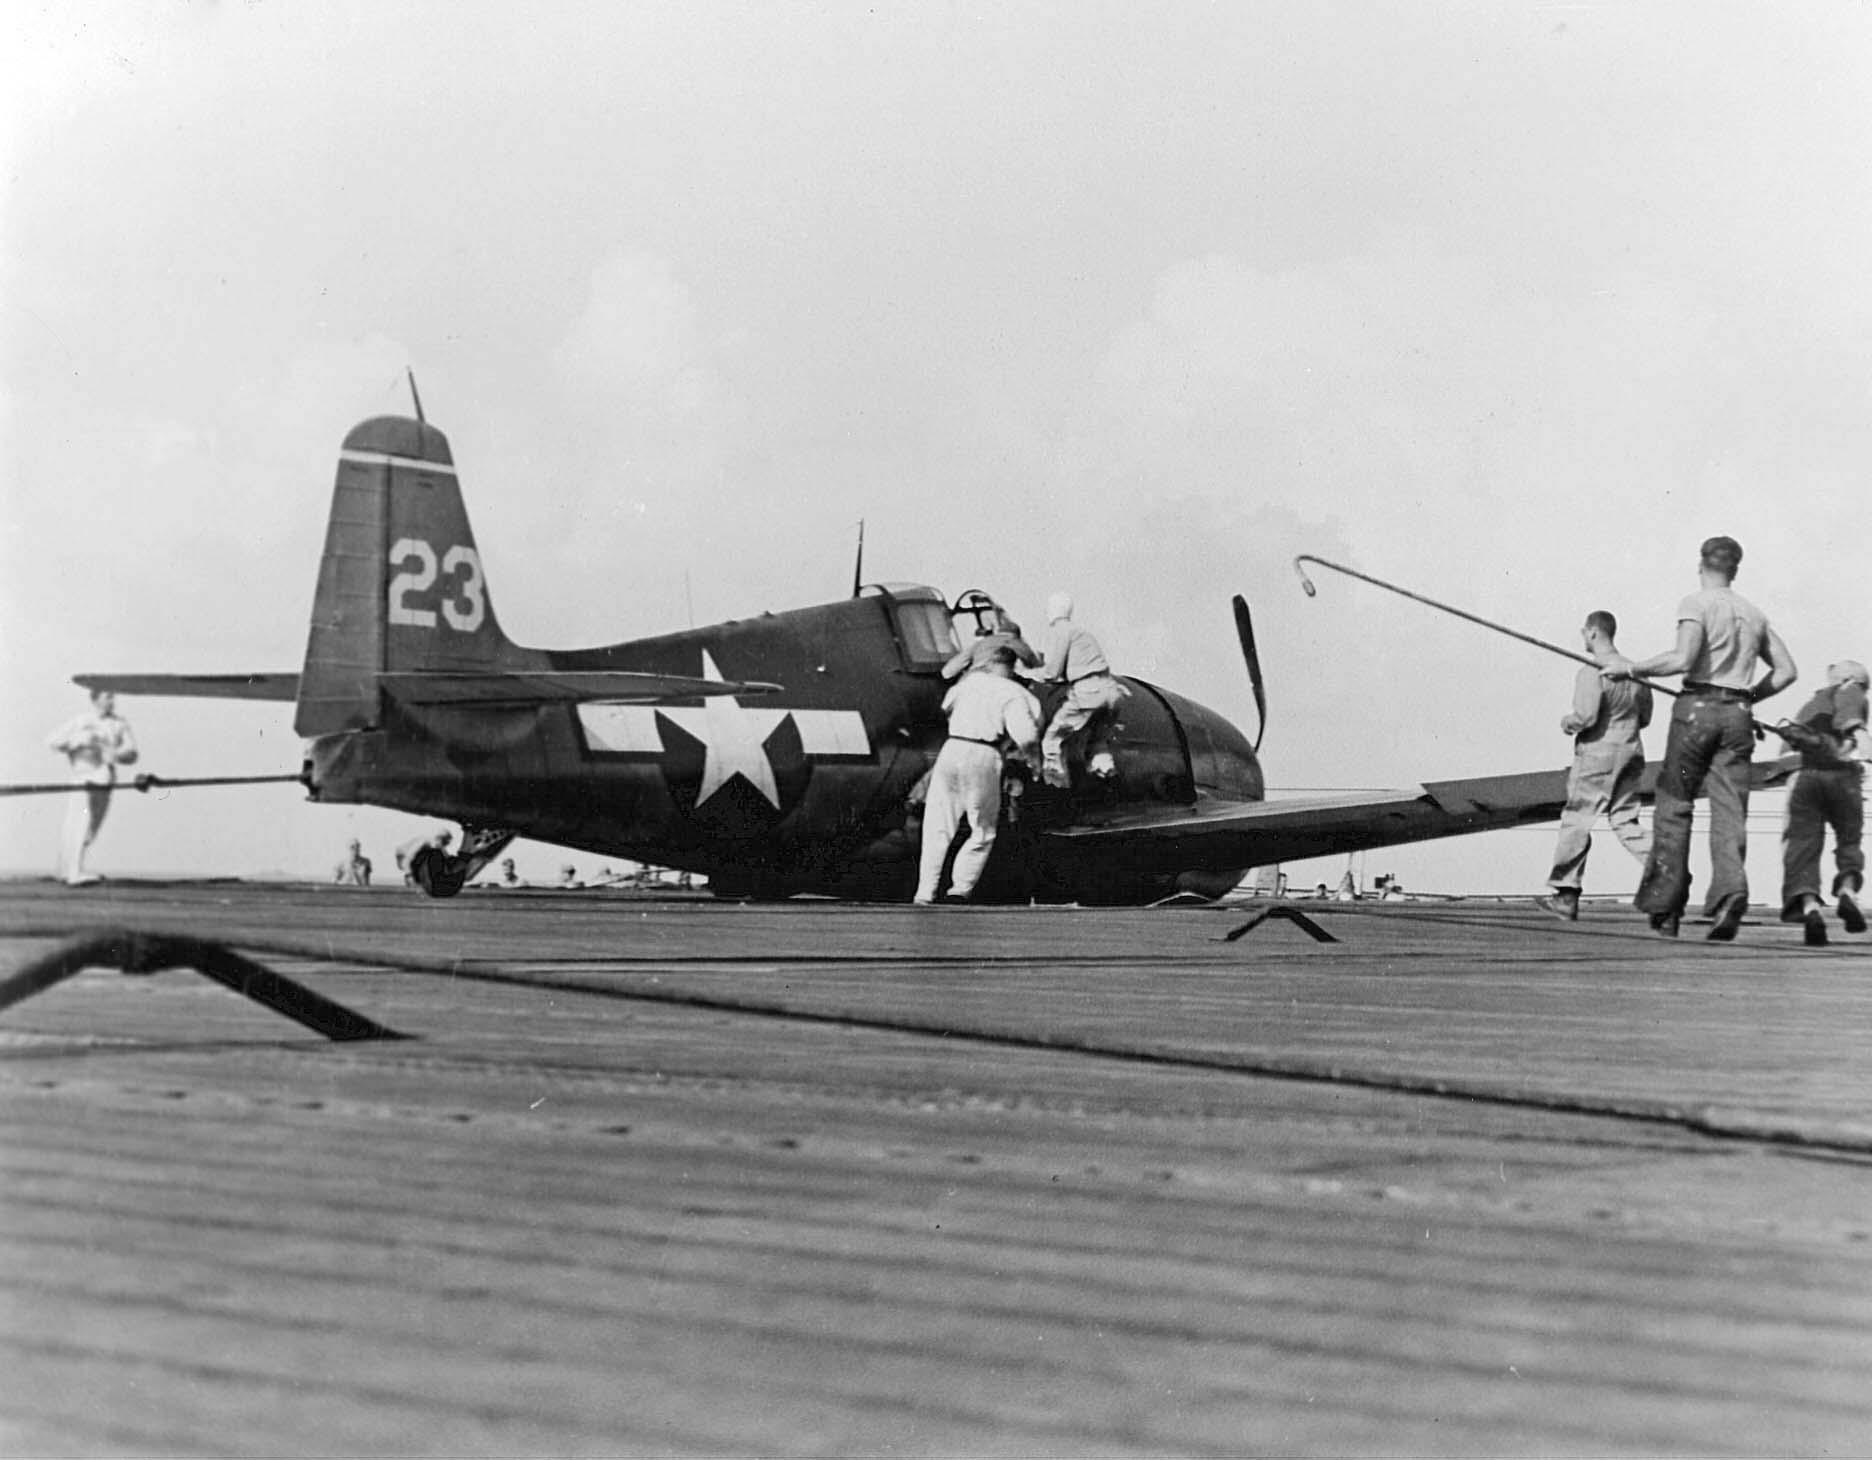 Grumman F6F 3 Hellcat VF 15 White 23 landing gear collapsed CV 9 USS Essex 1944 01